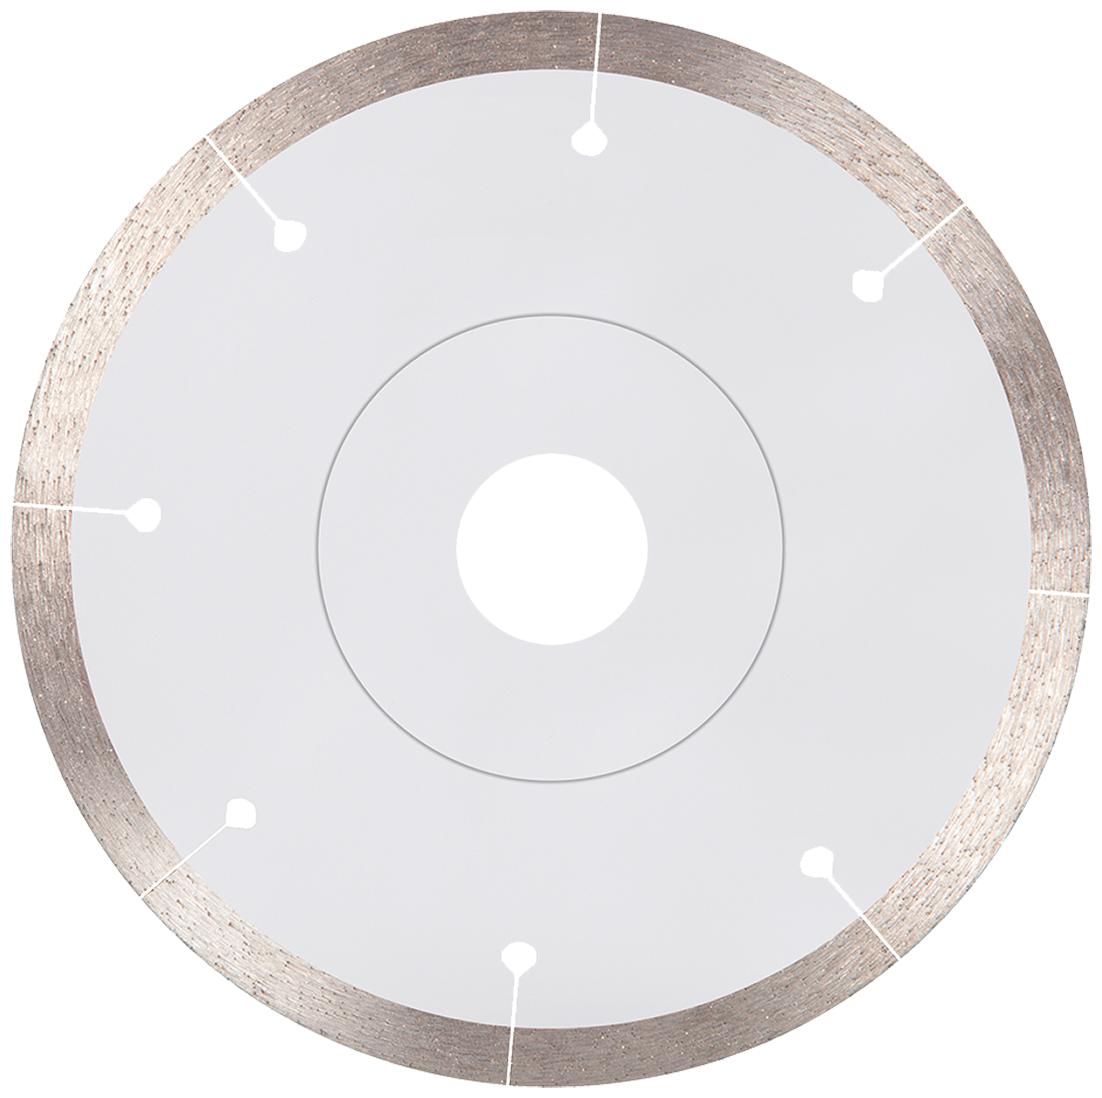 DIAREX Trennscheibe Glas / Keramik ø 300 mm